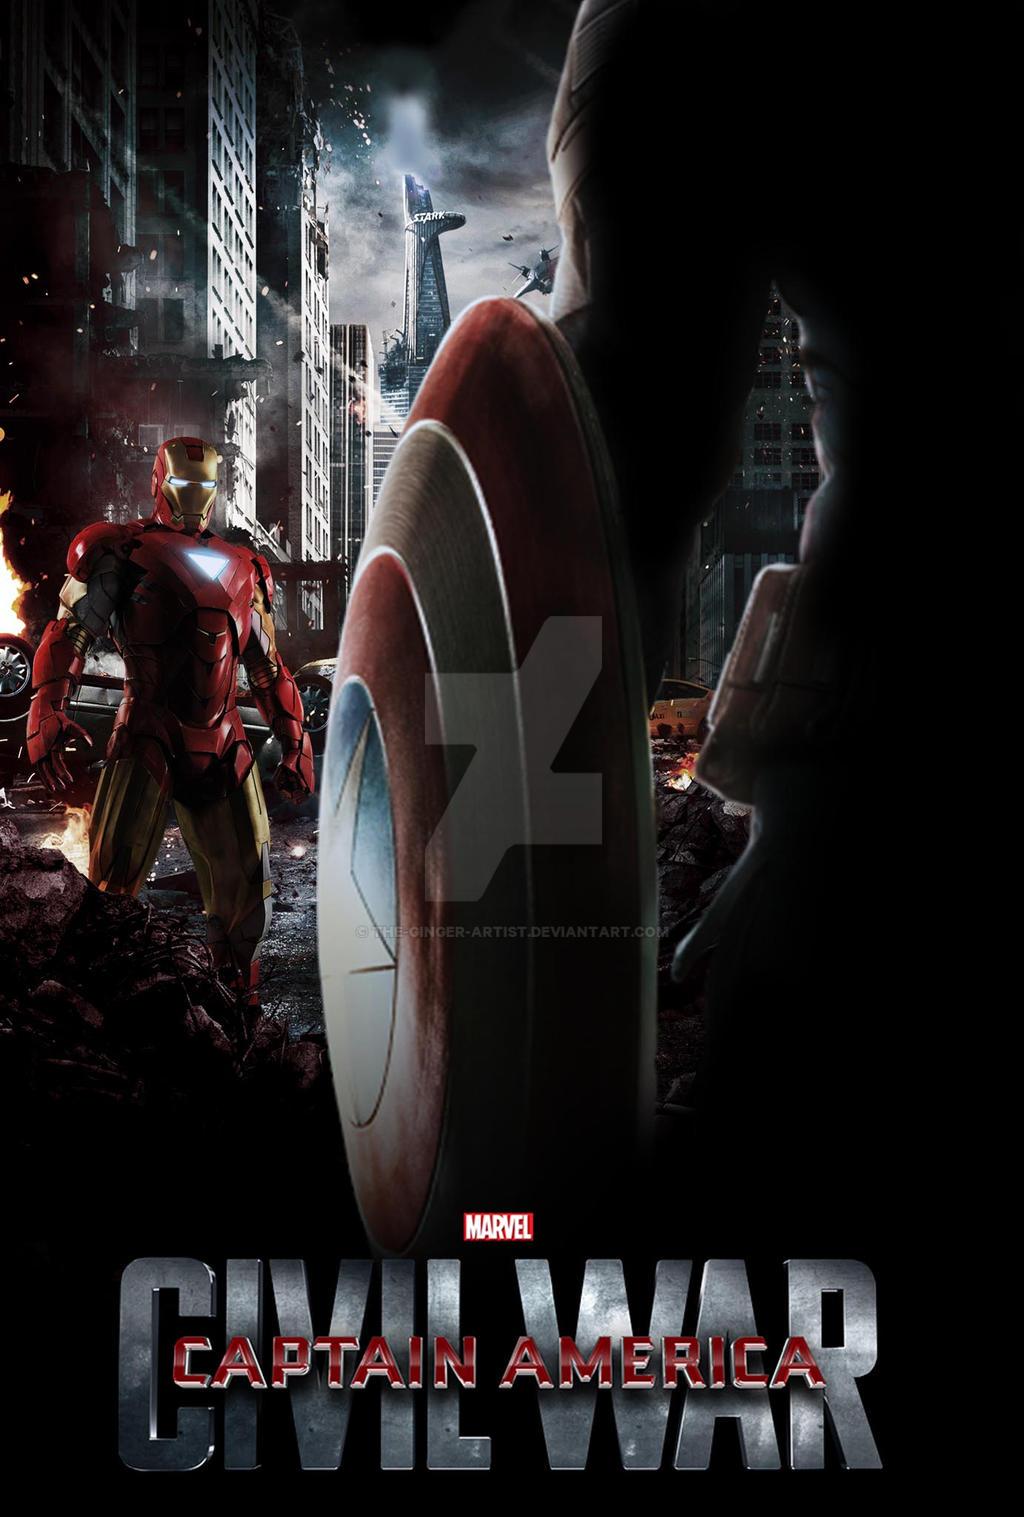 Great Wallpaper Movie Captain America Civil War - captain_america__civil_war_poster_by_the_ginger_artist-d8g6cua  2018_793939.jpg